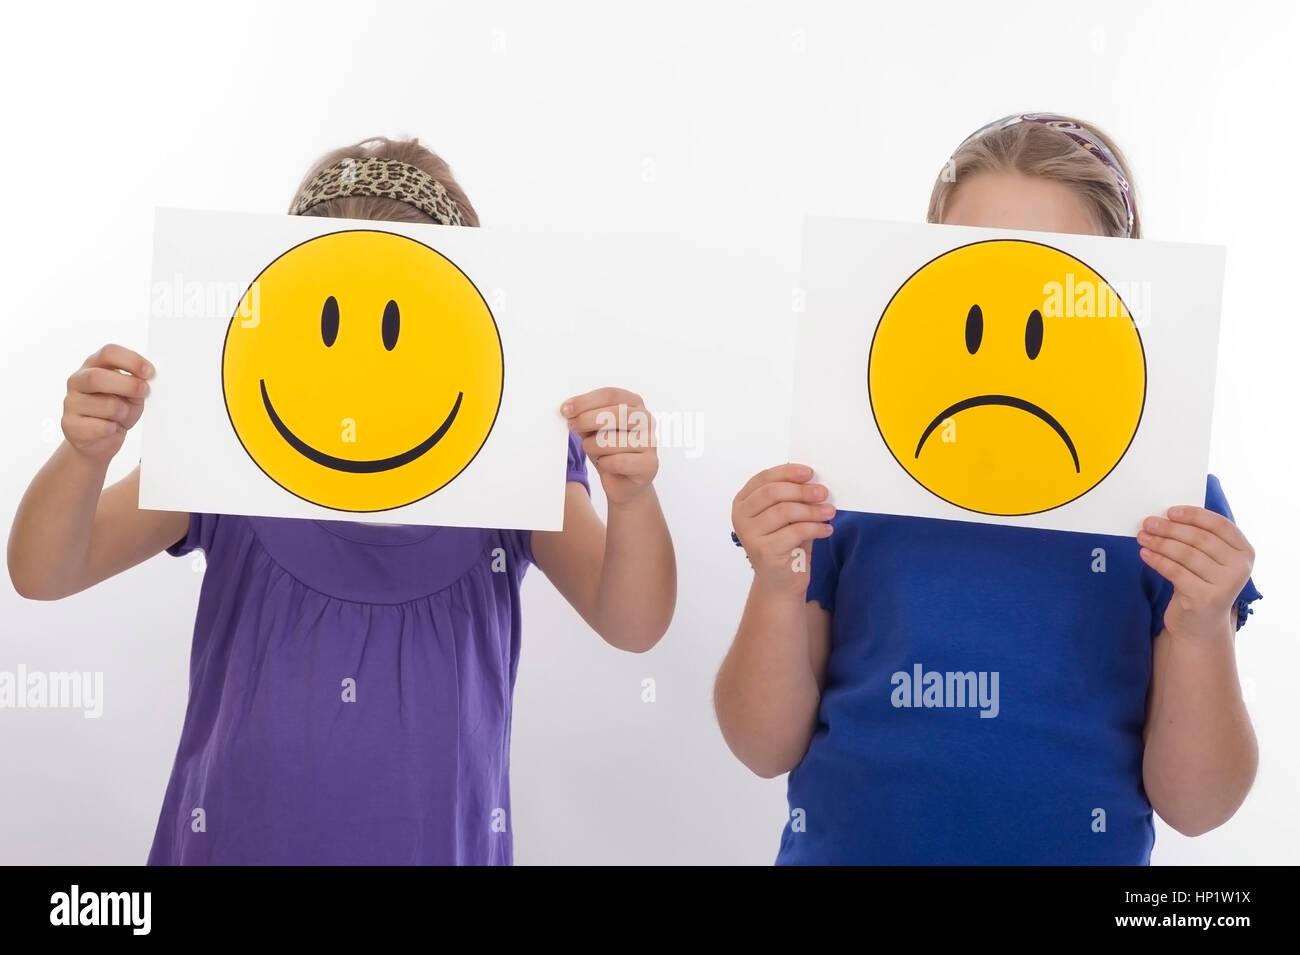 Model release , Trauriges und froehliches Kind, Symbolbild - sad an happy children, symbolic Stock Photo